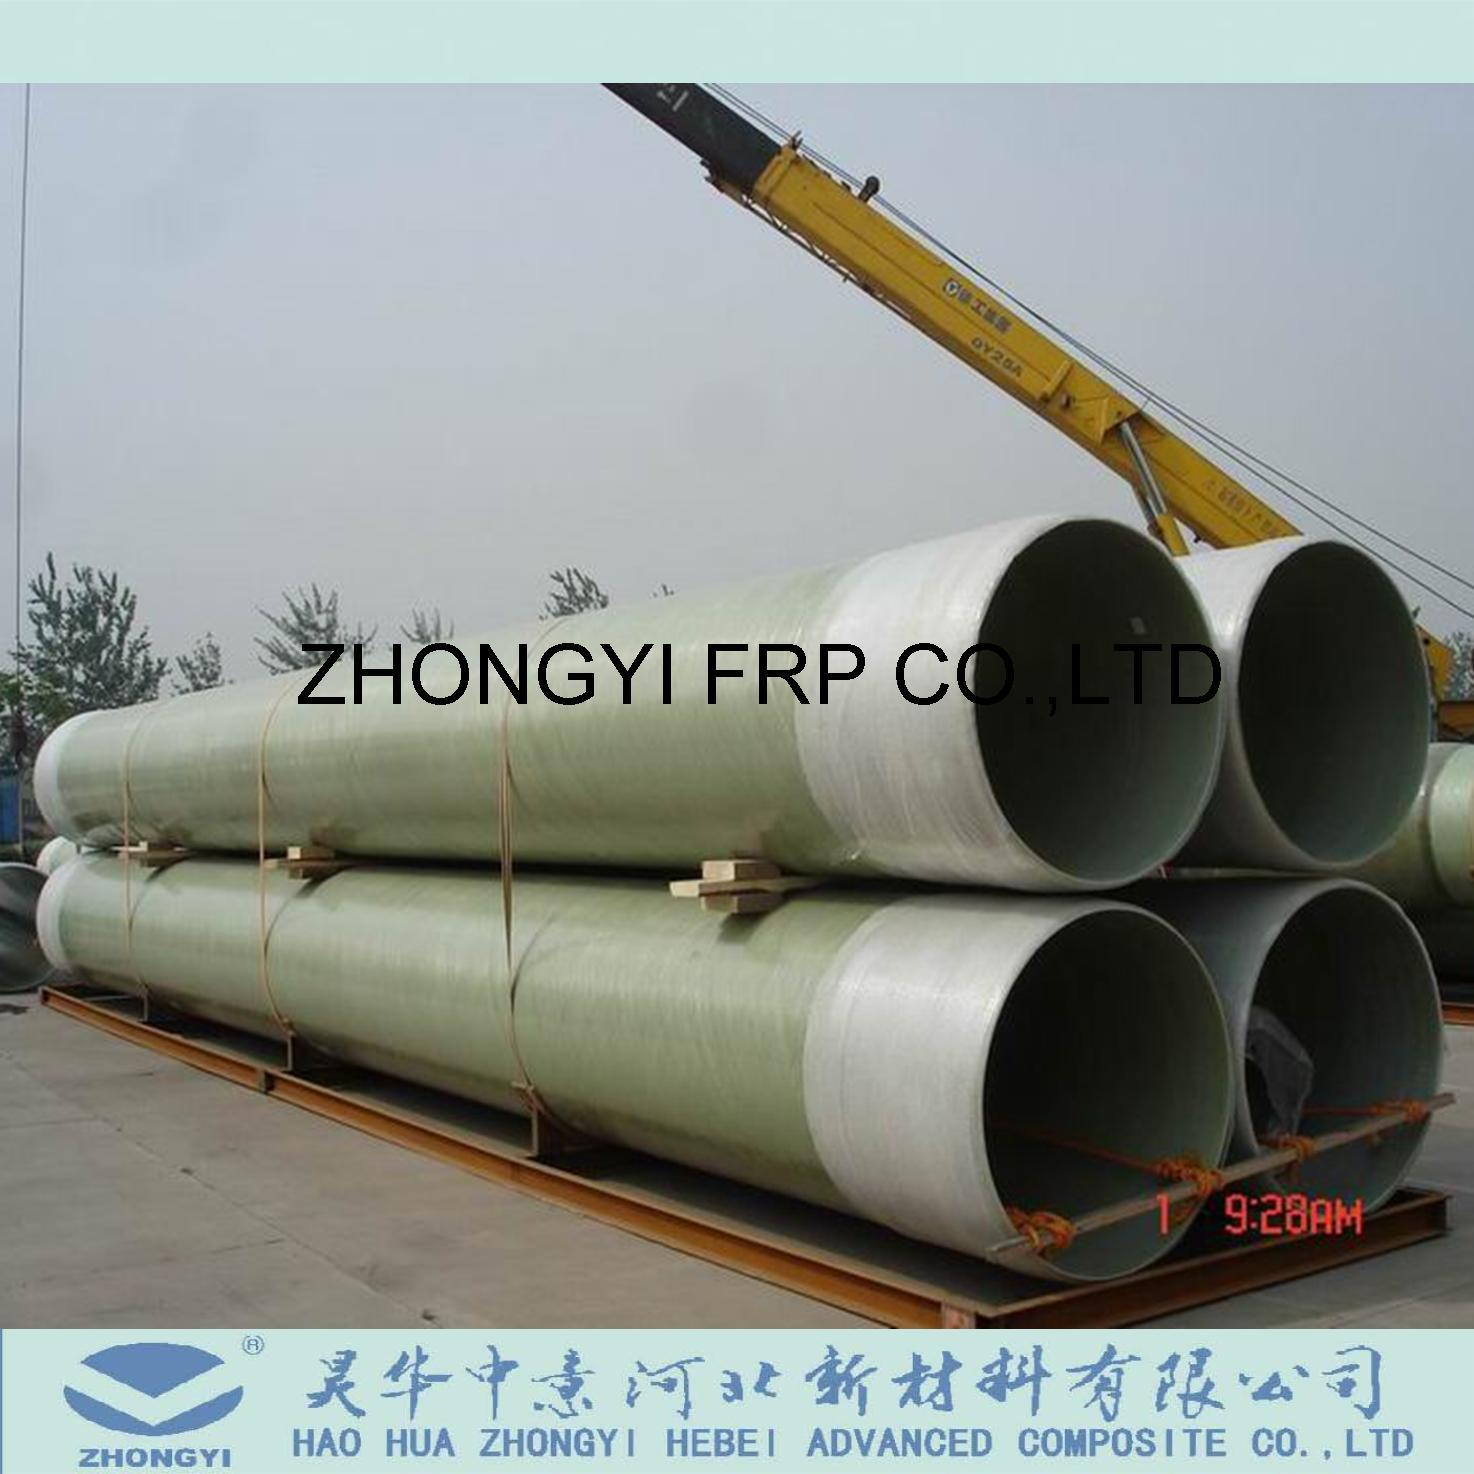 [Hot Item] GRP FRP Process Fiberglass Pipe